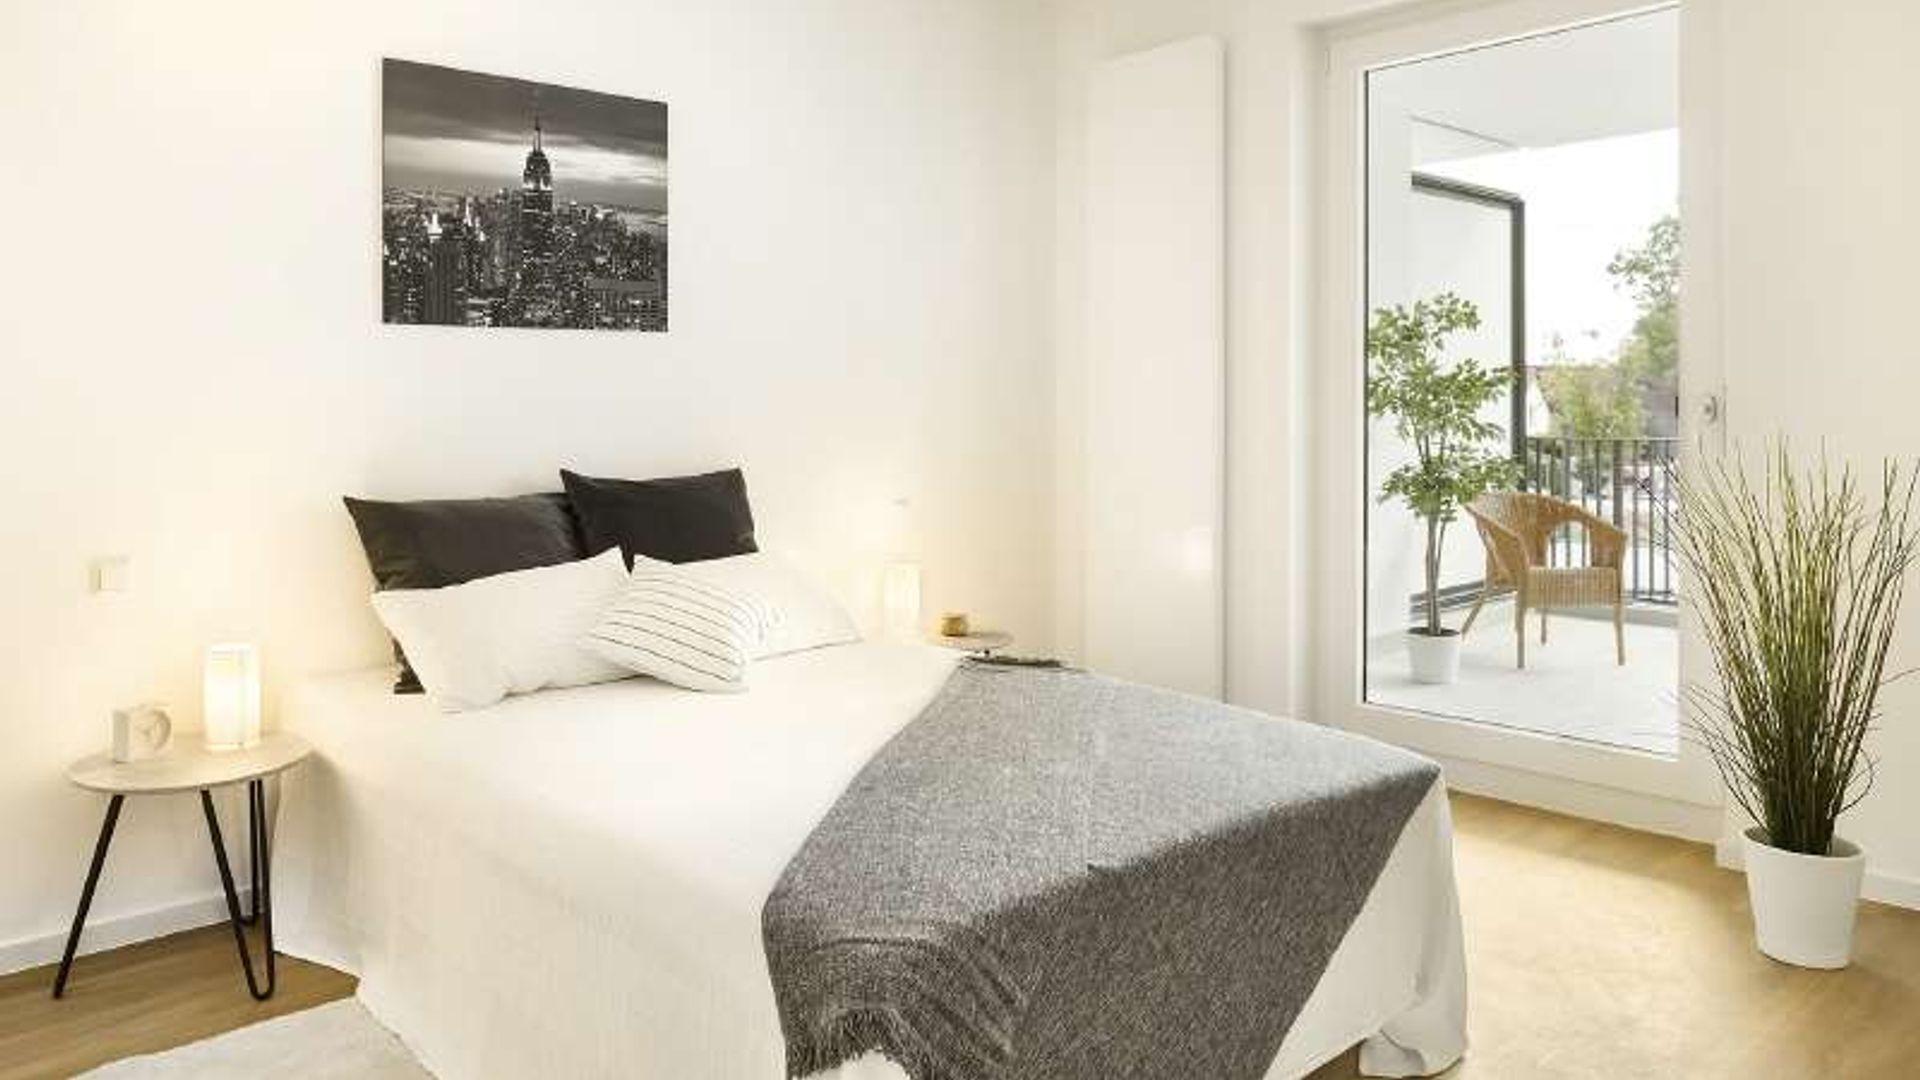 3 bedroom apartment at Rathausgasse 6, 12529 Schönefeld